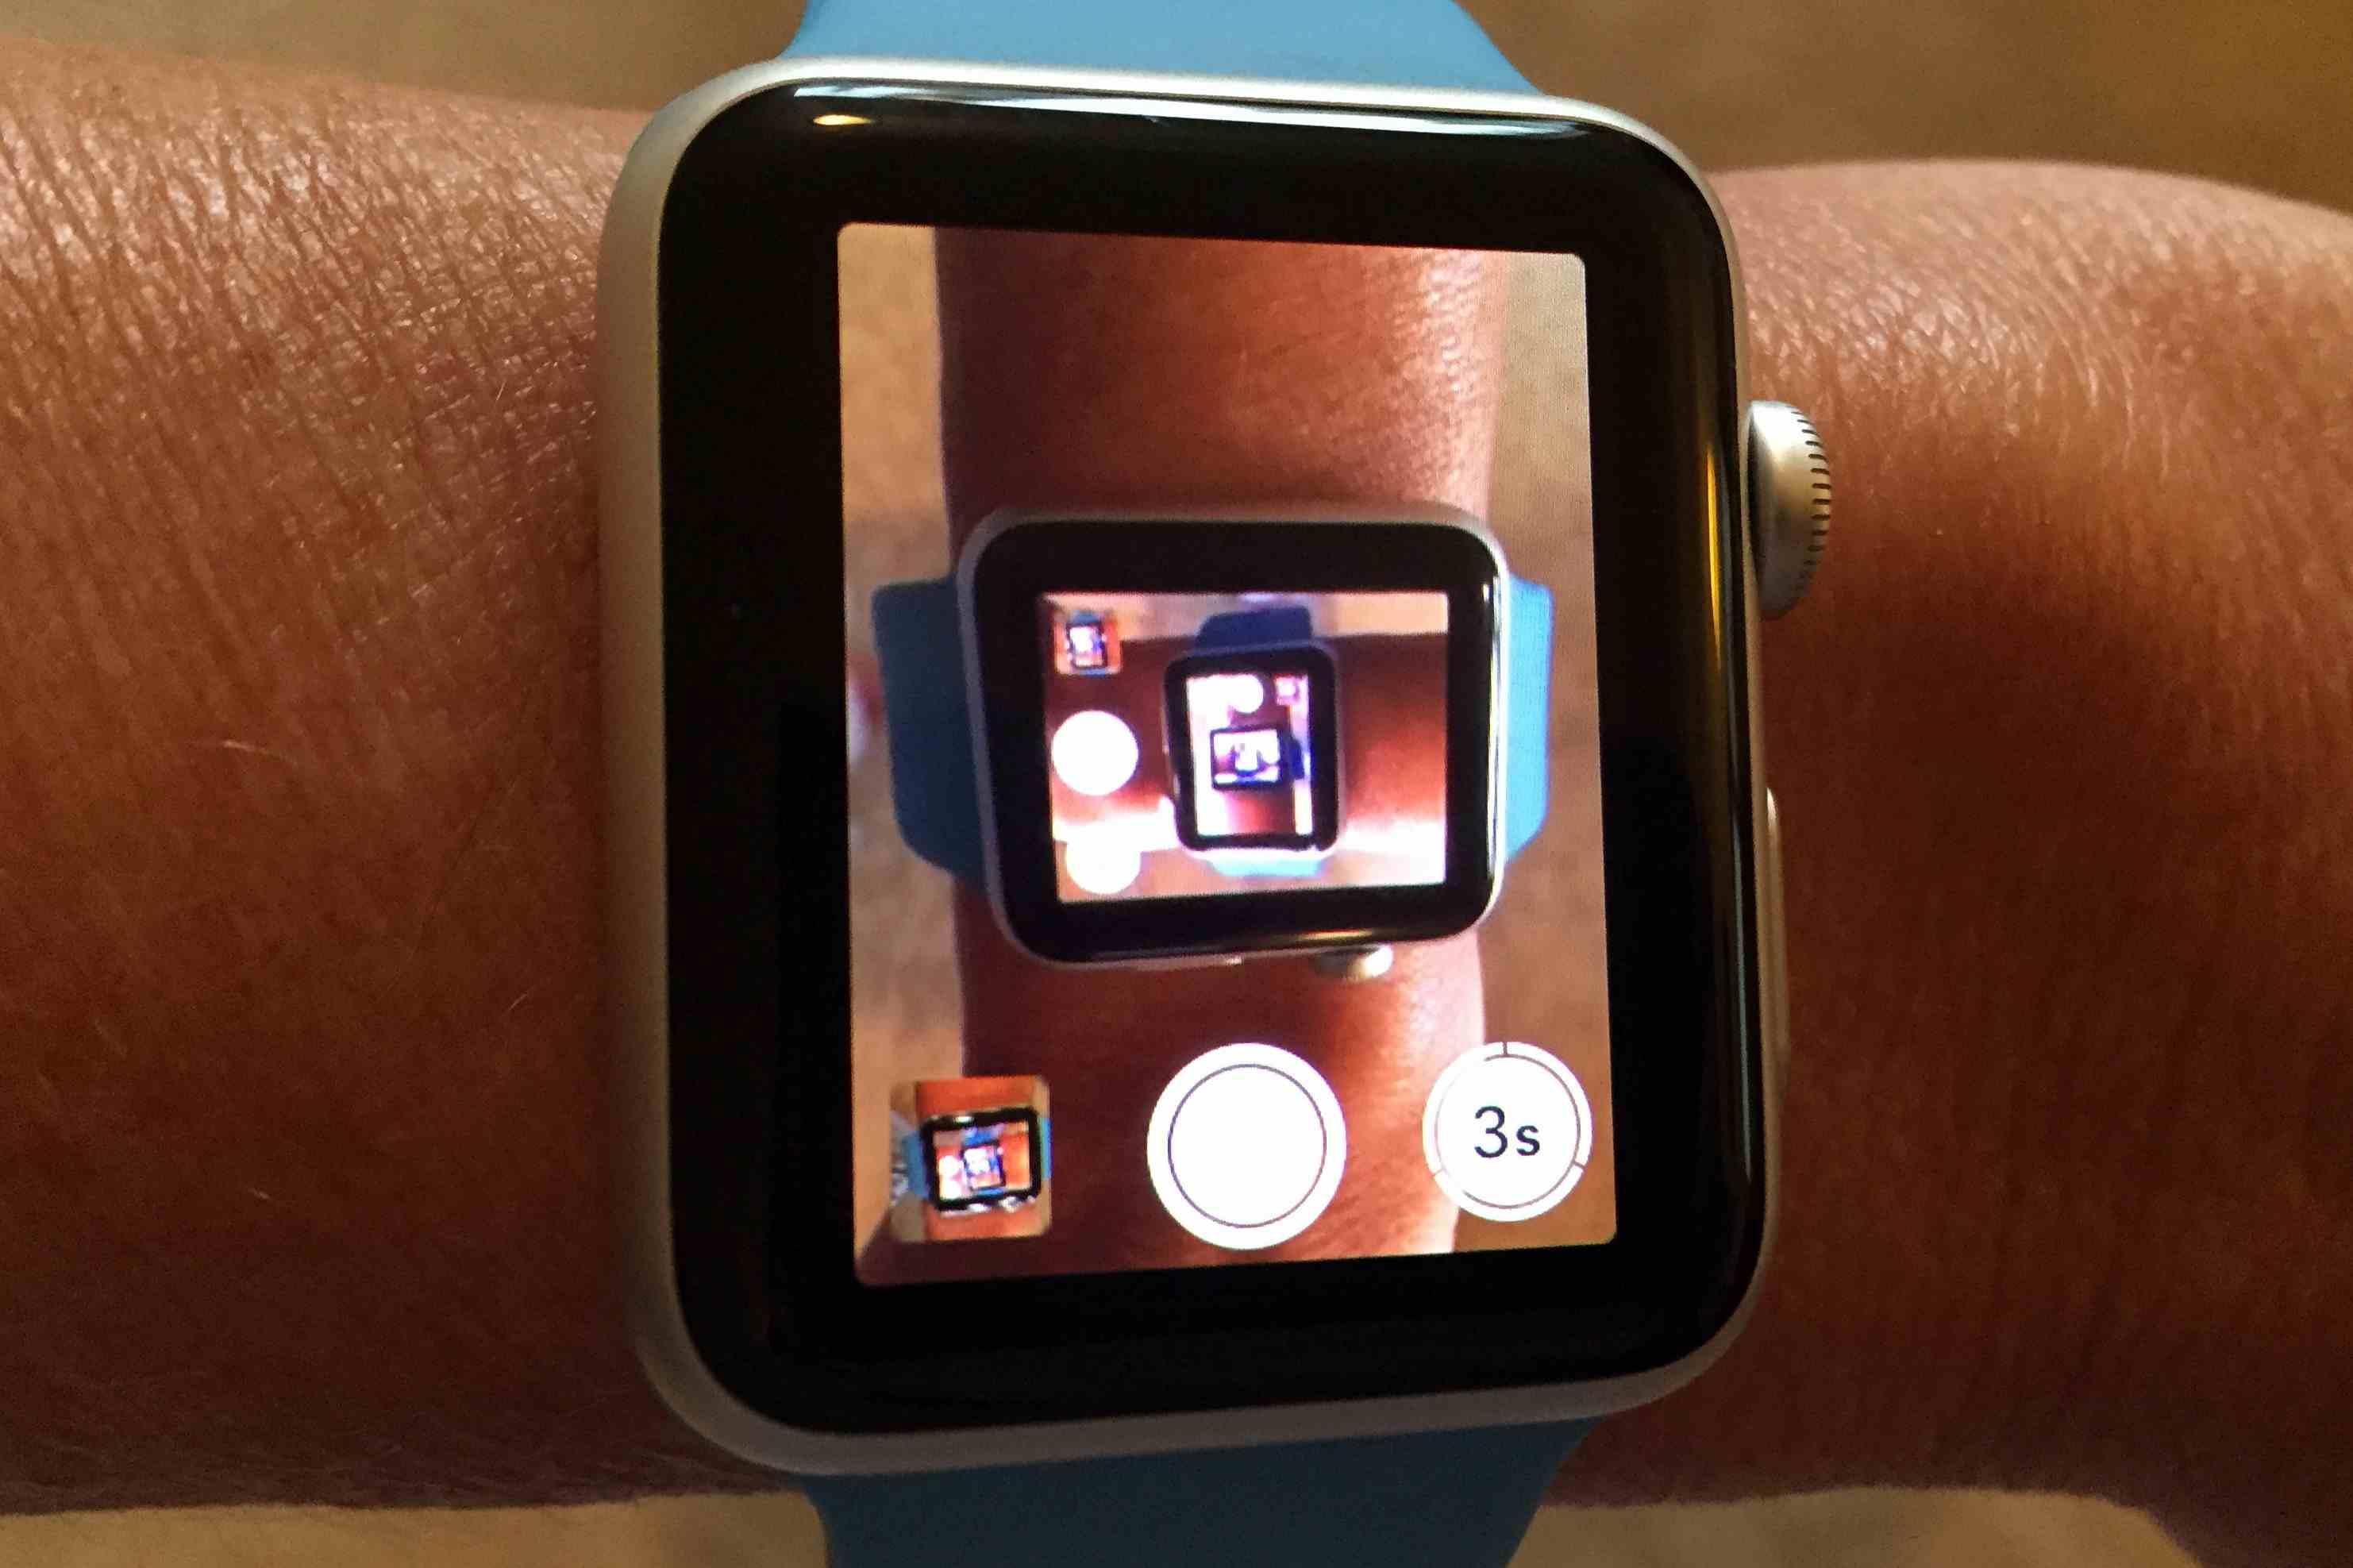 Apple Watch Features Walkers Love